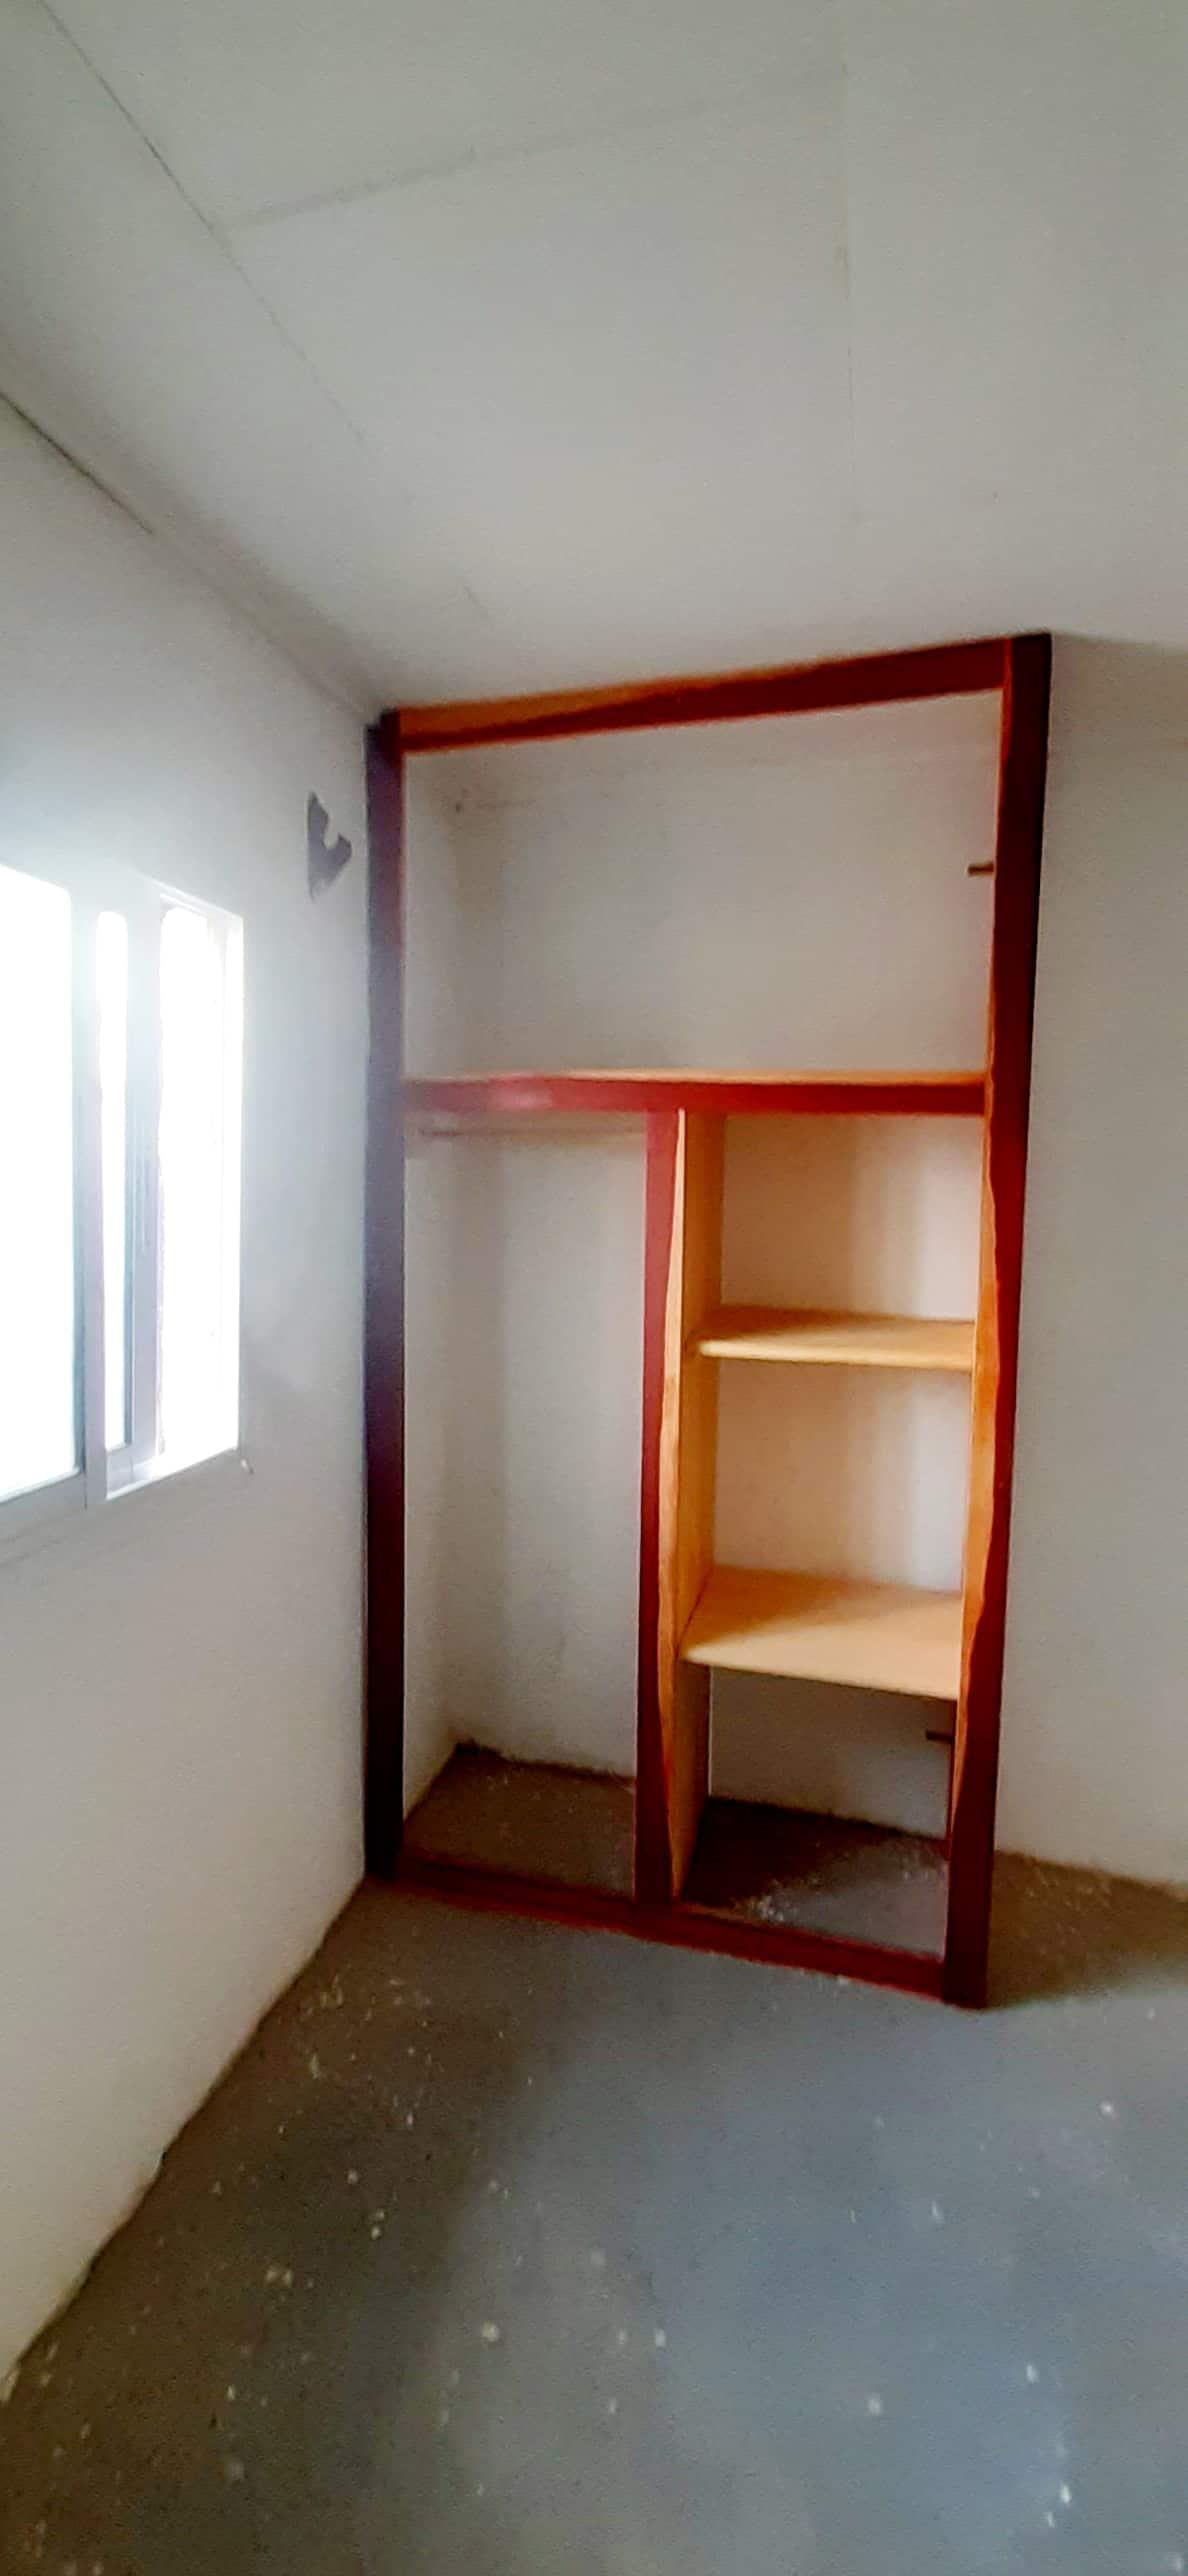 Apartment to rent - Douala, Bepanda, Bepanda mala - 1 living room(s), 1 bedroom(s), 1 bathroom(s) - 70 000 FCFA / month